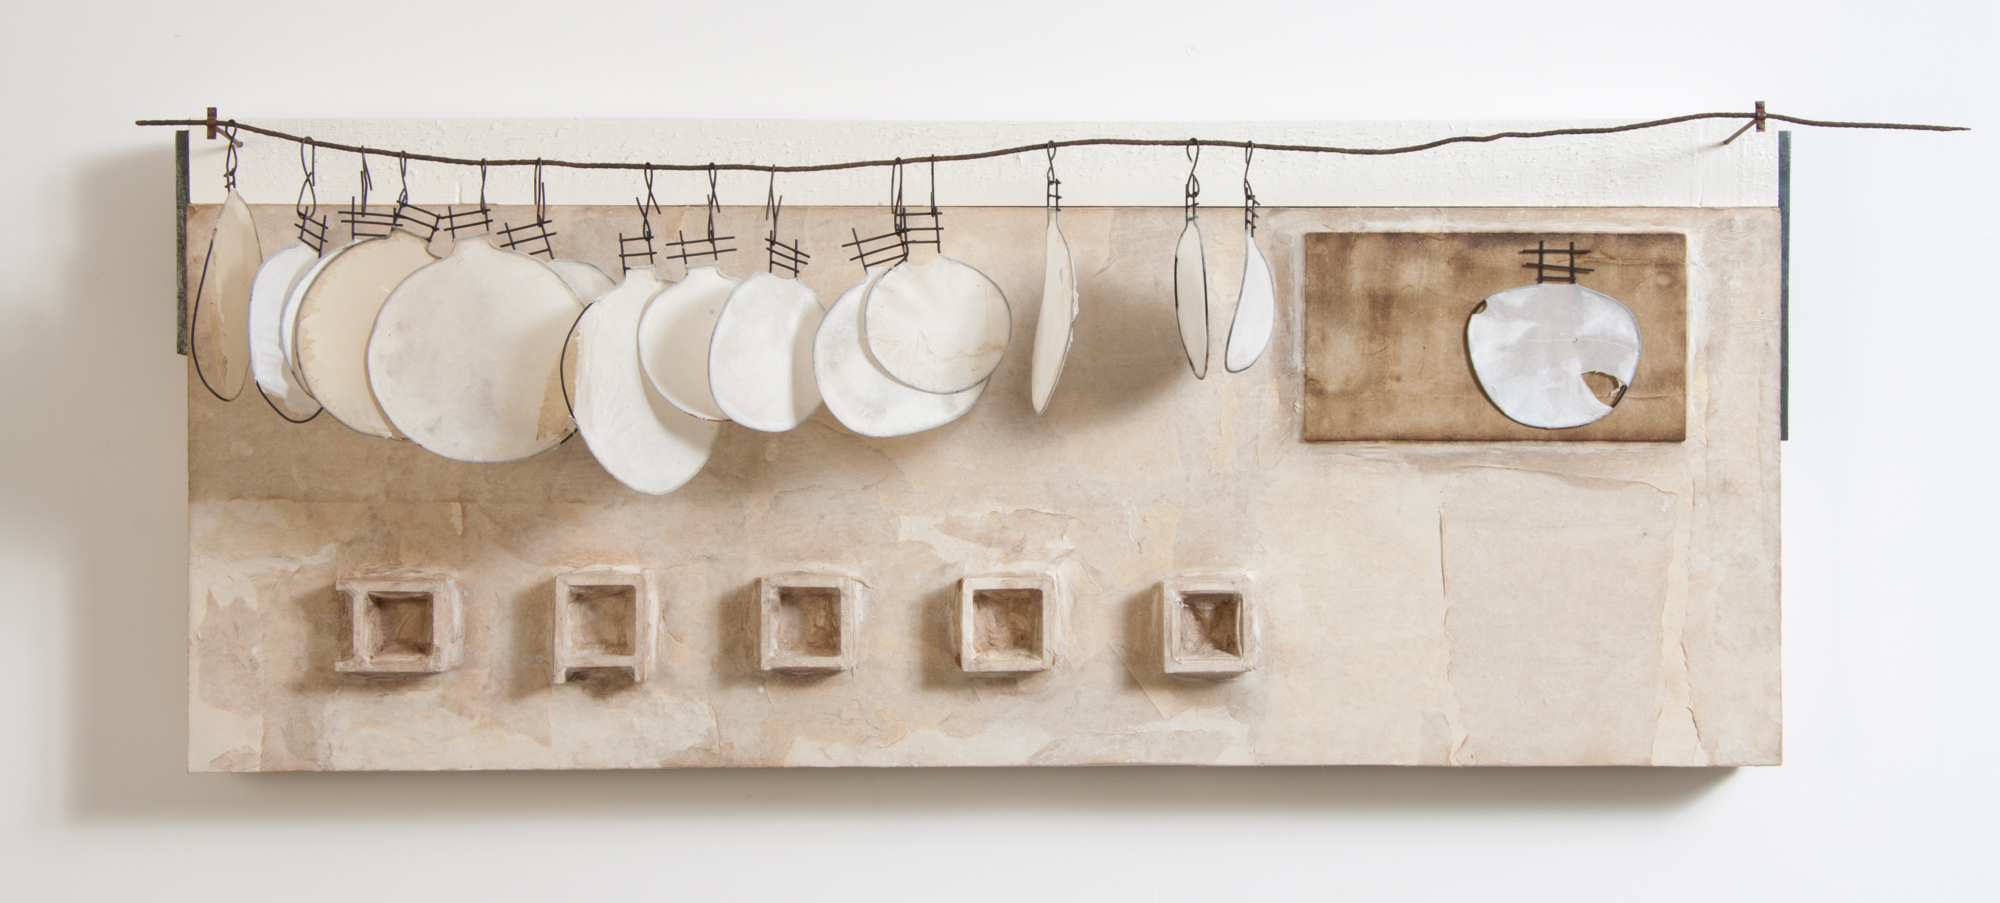 "Pamela J Wallace Industrial weeds, 16.5"" x 44"" x 10"", mixed media,handmade abaca paper, iron, wire, sheet metal, wood"